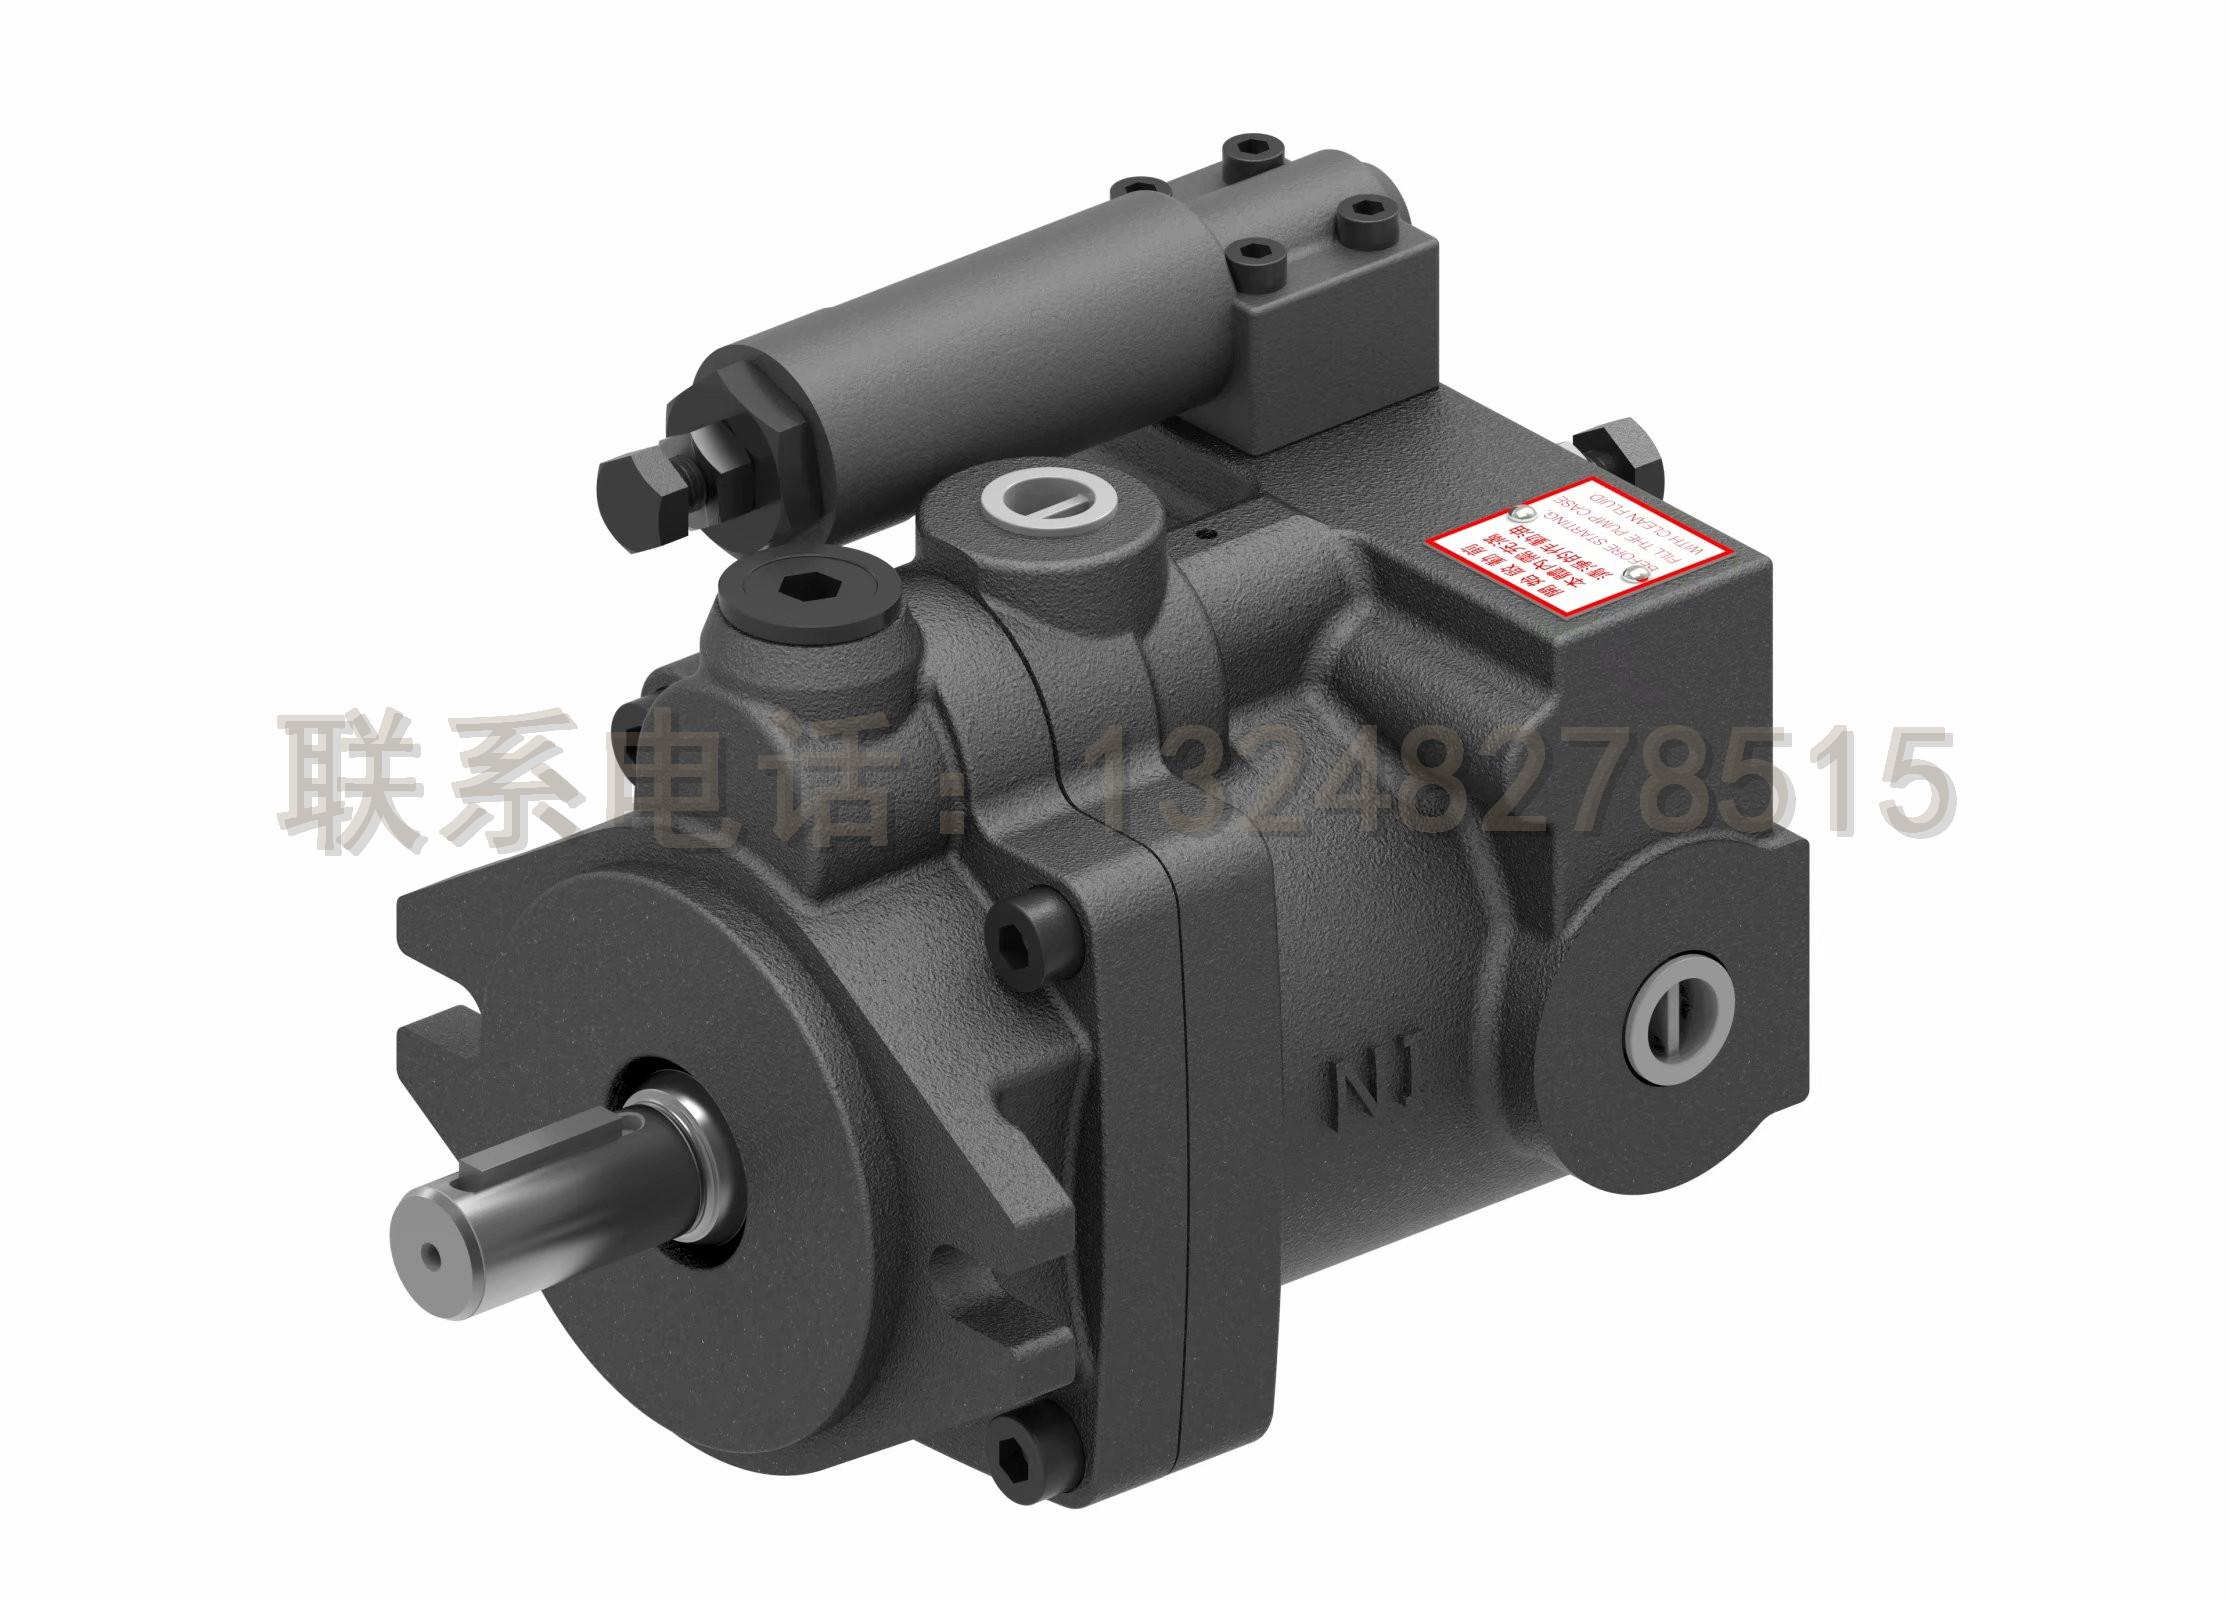 台湾YEOSHE油升P16-A0/A1/A2-F-R-01 P16-A3/A4-F-R-01柱塞泵批发